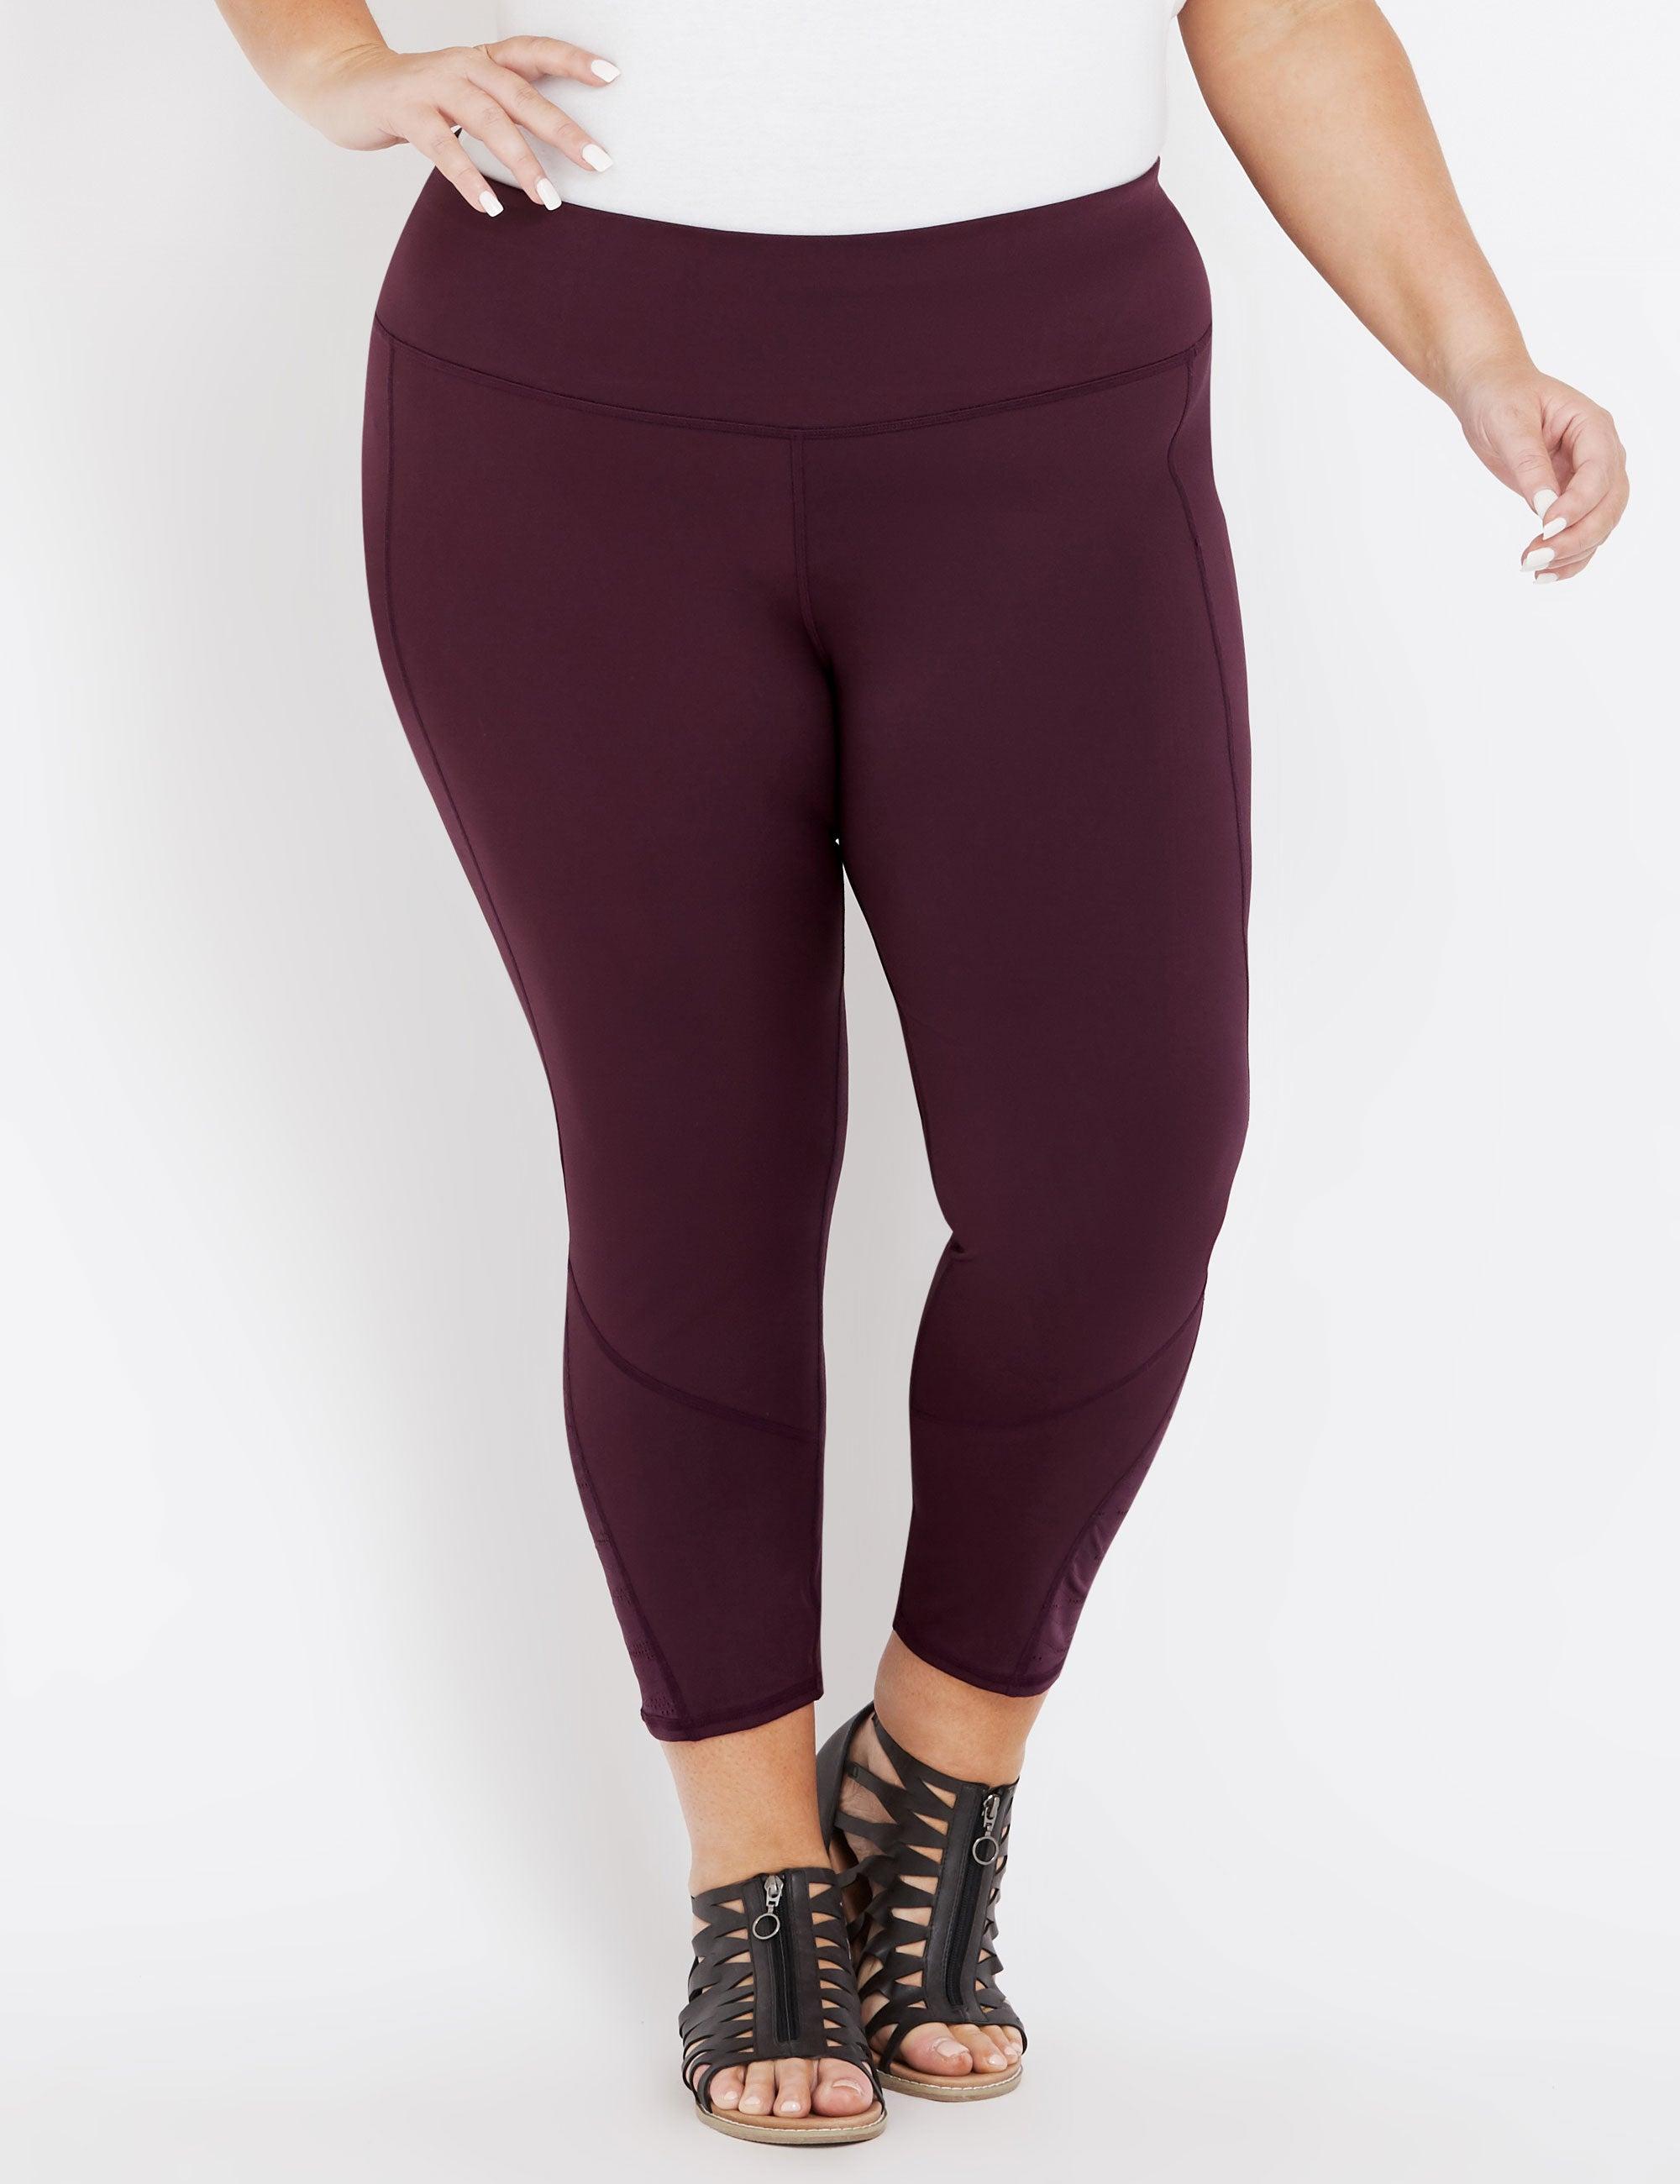 Girls Womens New Size 18 20 22 New Stretch Denim Knee Length Black Shorts Womens